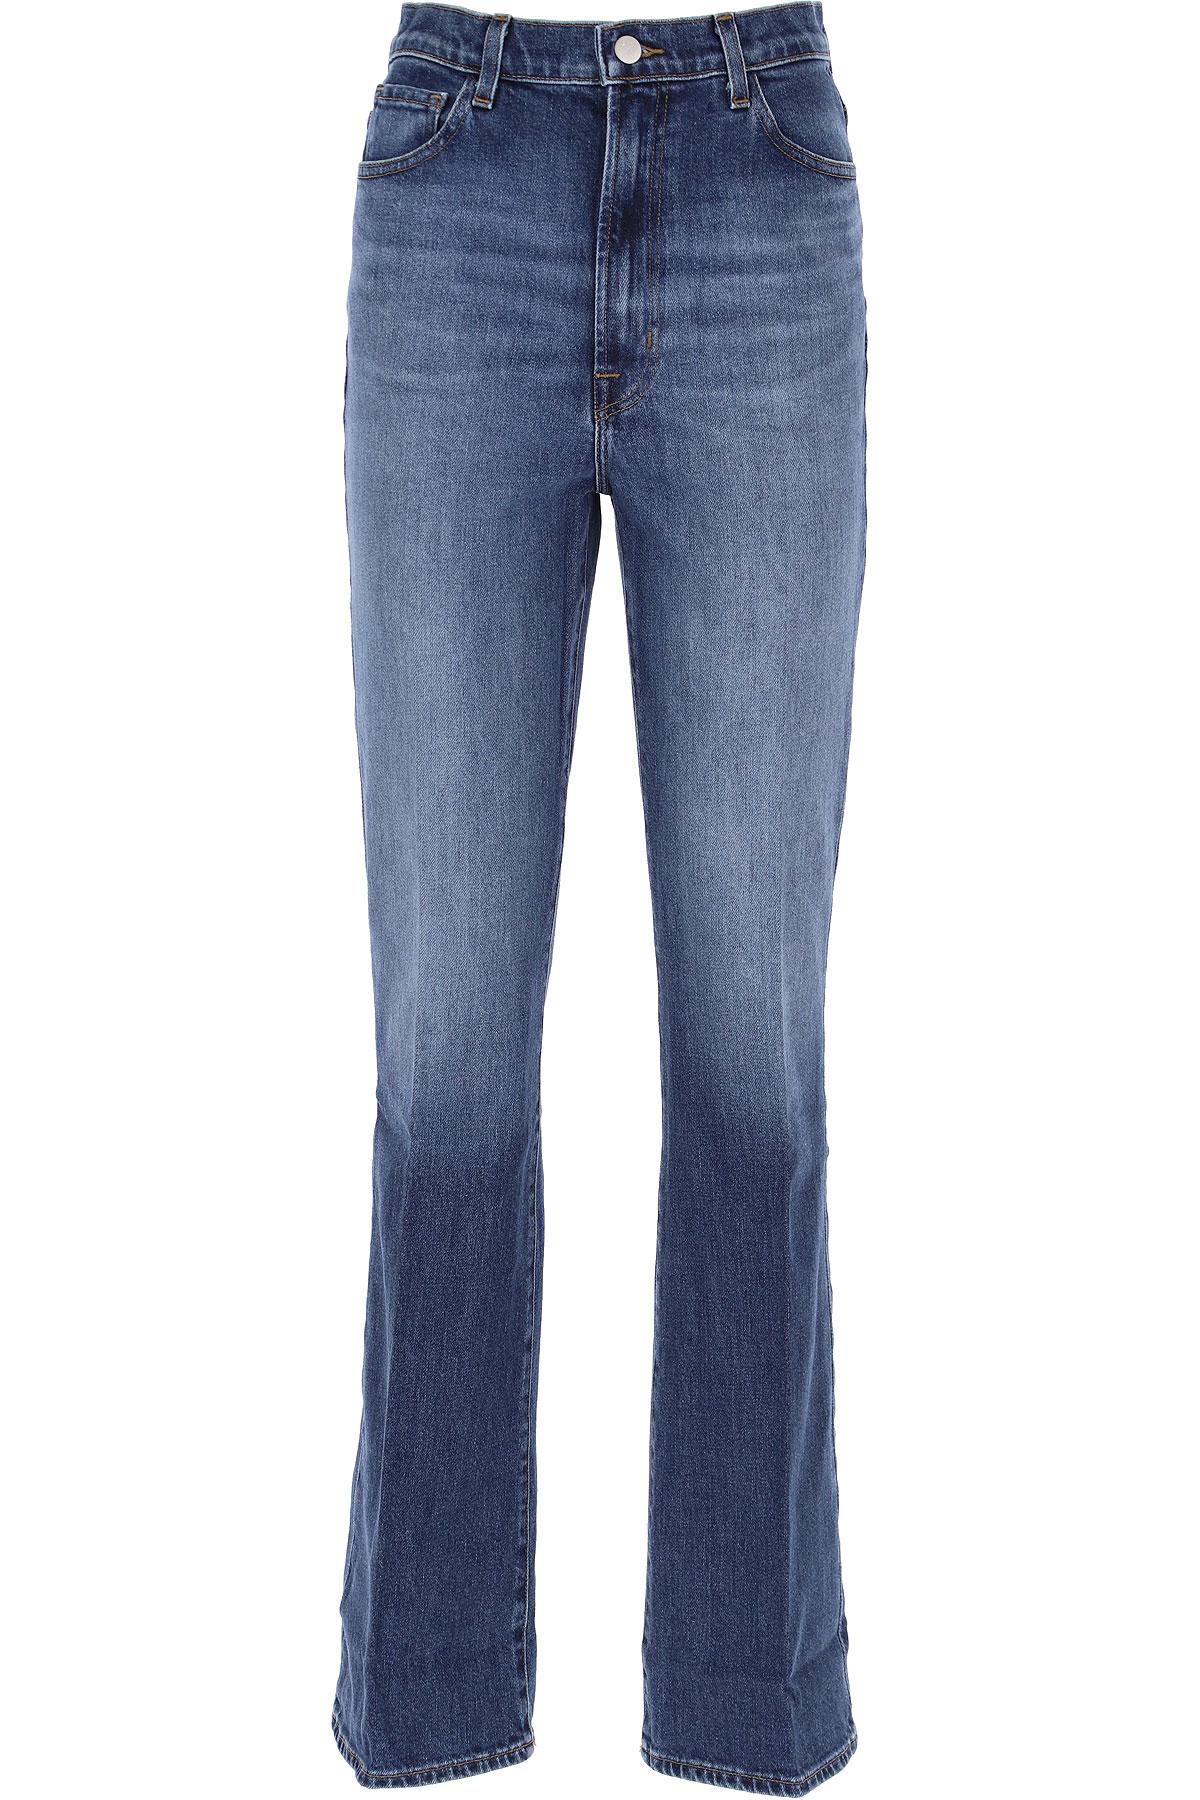 J Brand Jeans On Sale, Medium Blue Denim, Cotton, 2019, 24 25 26 27 28 29